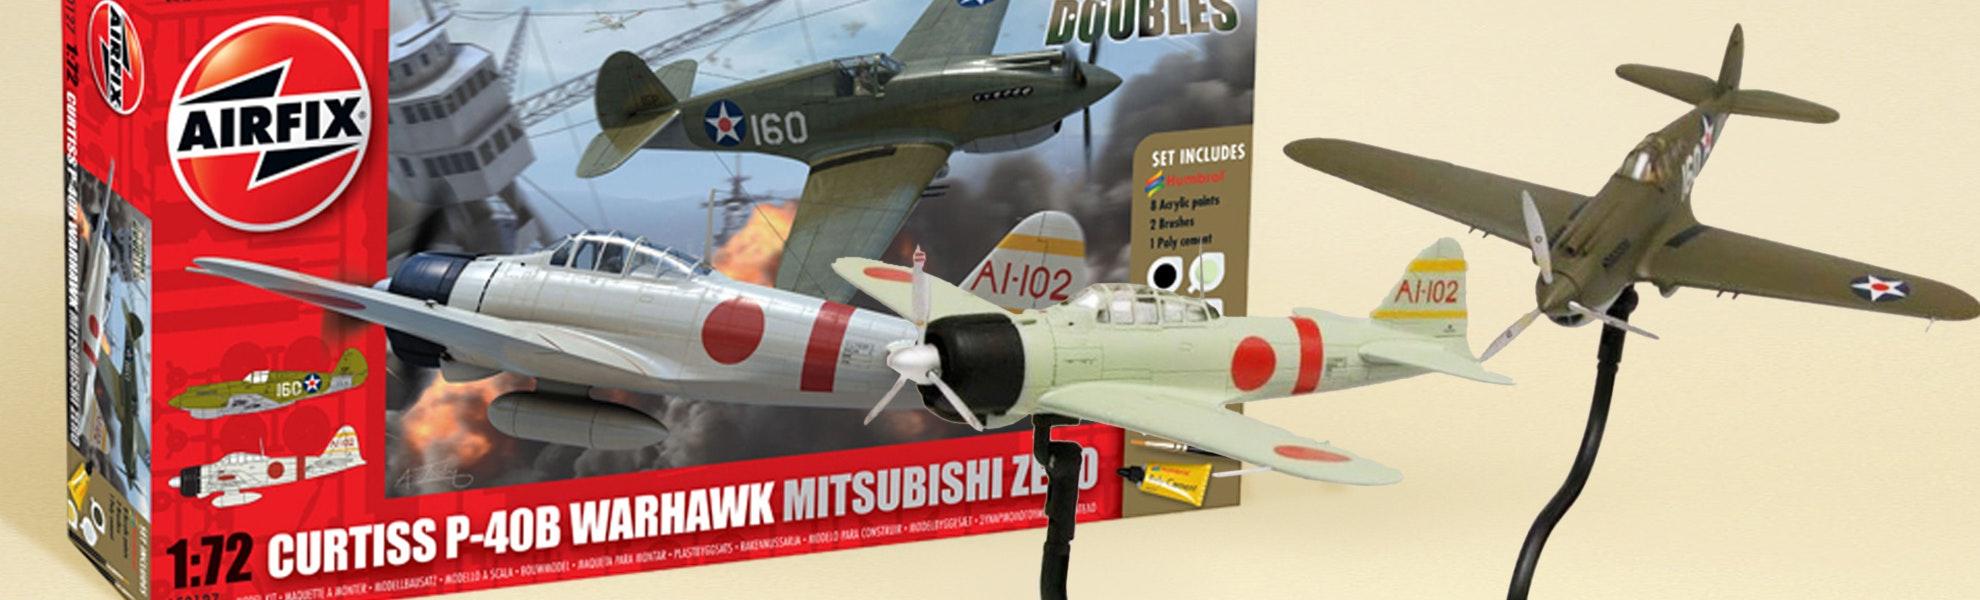 Airfix Dogfighting Doubles: P-40 Warhawk & Zero